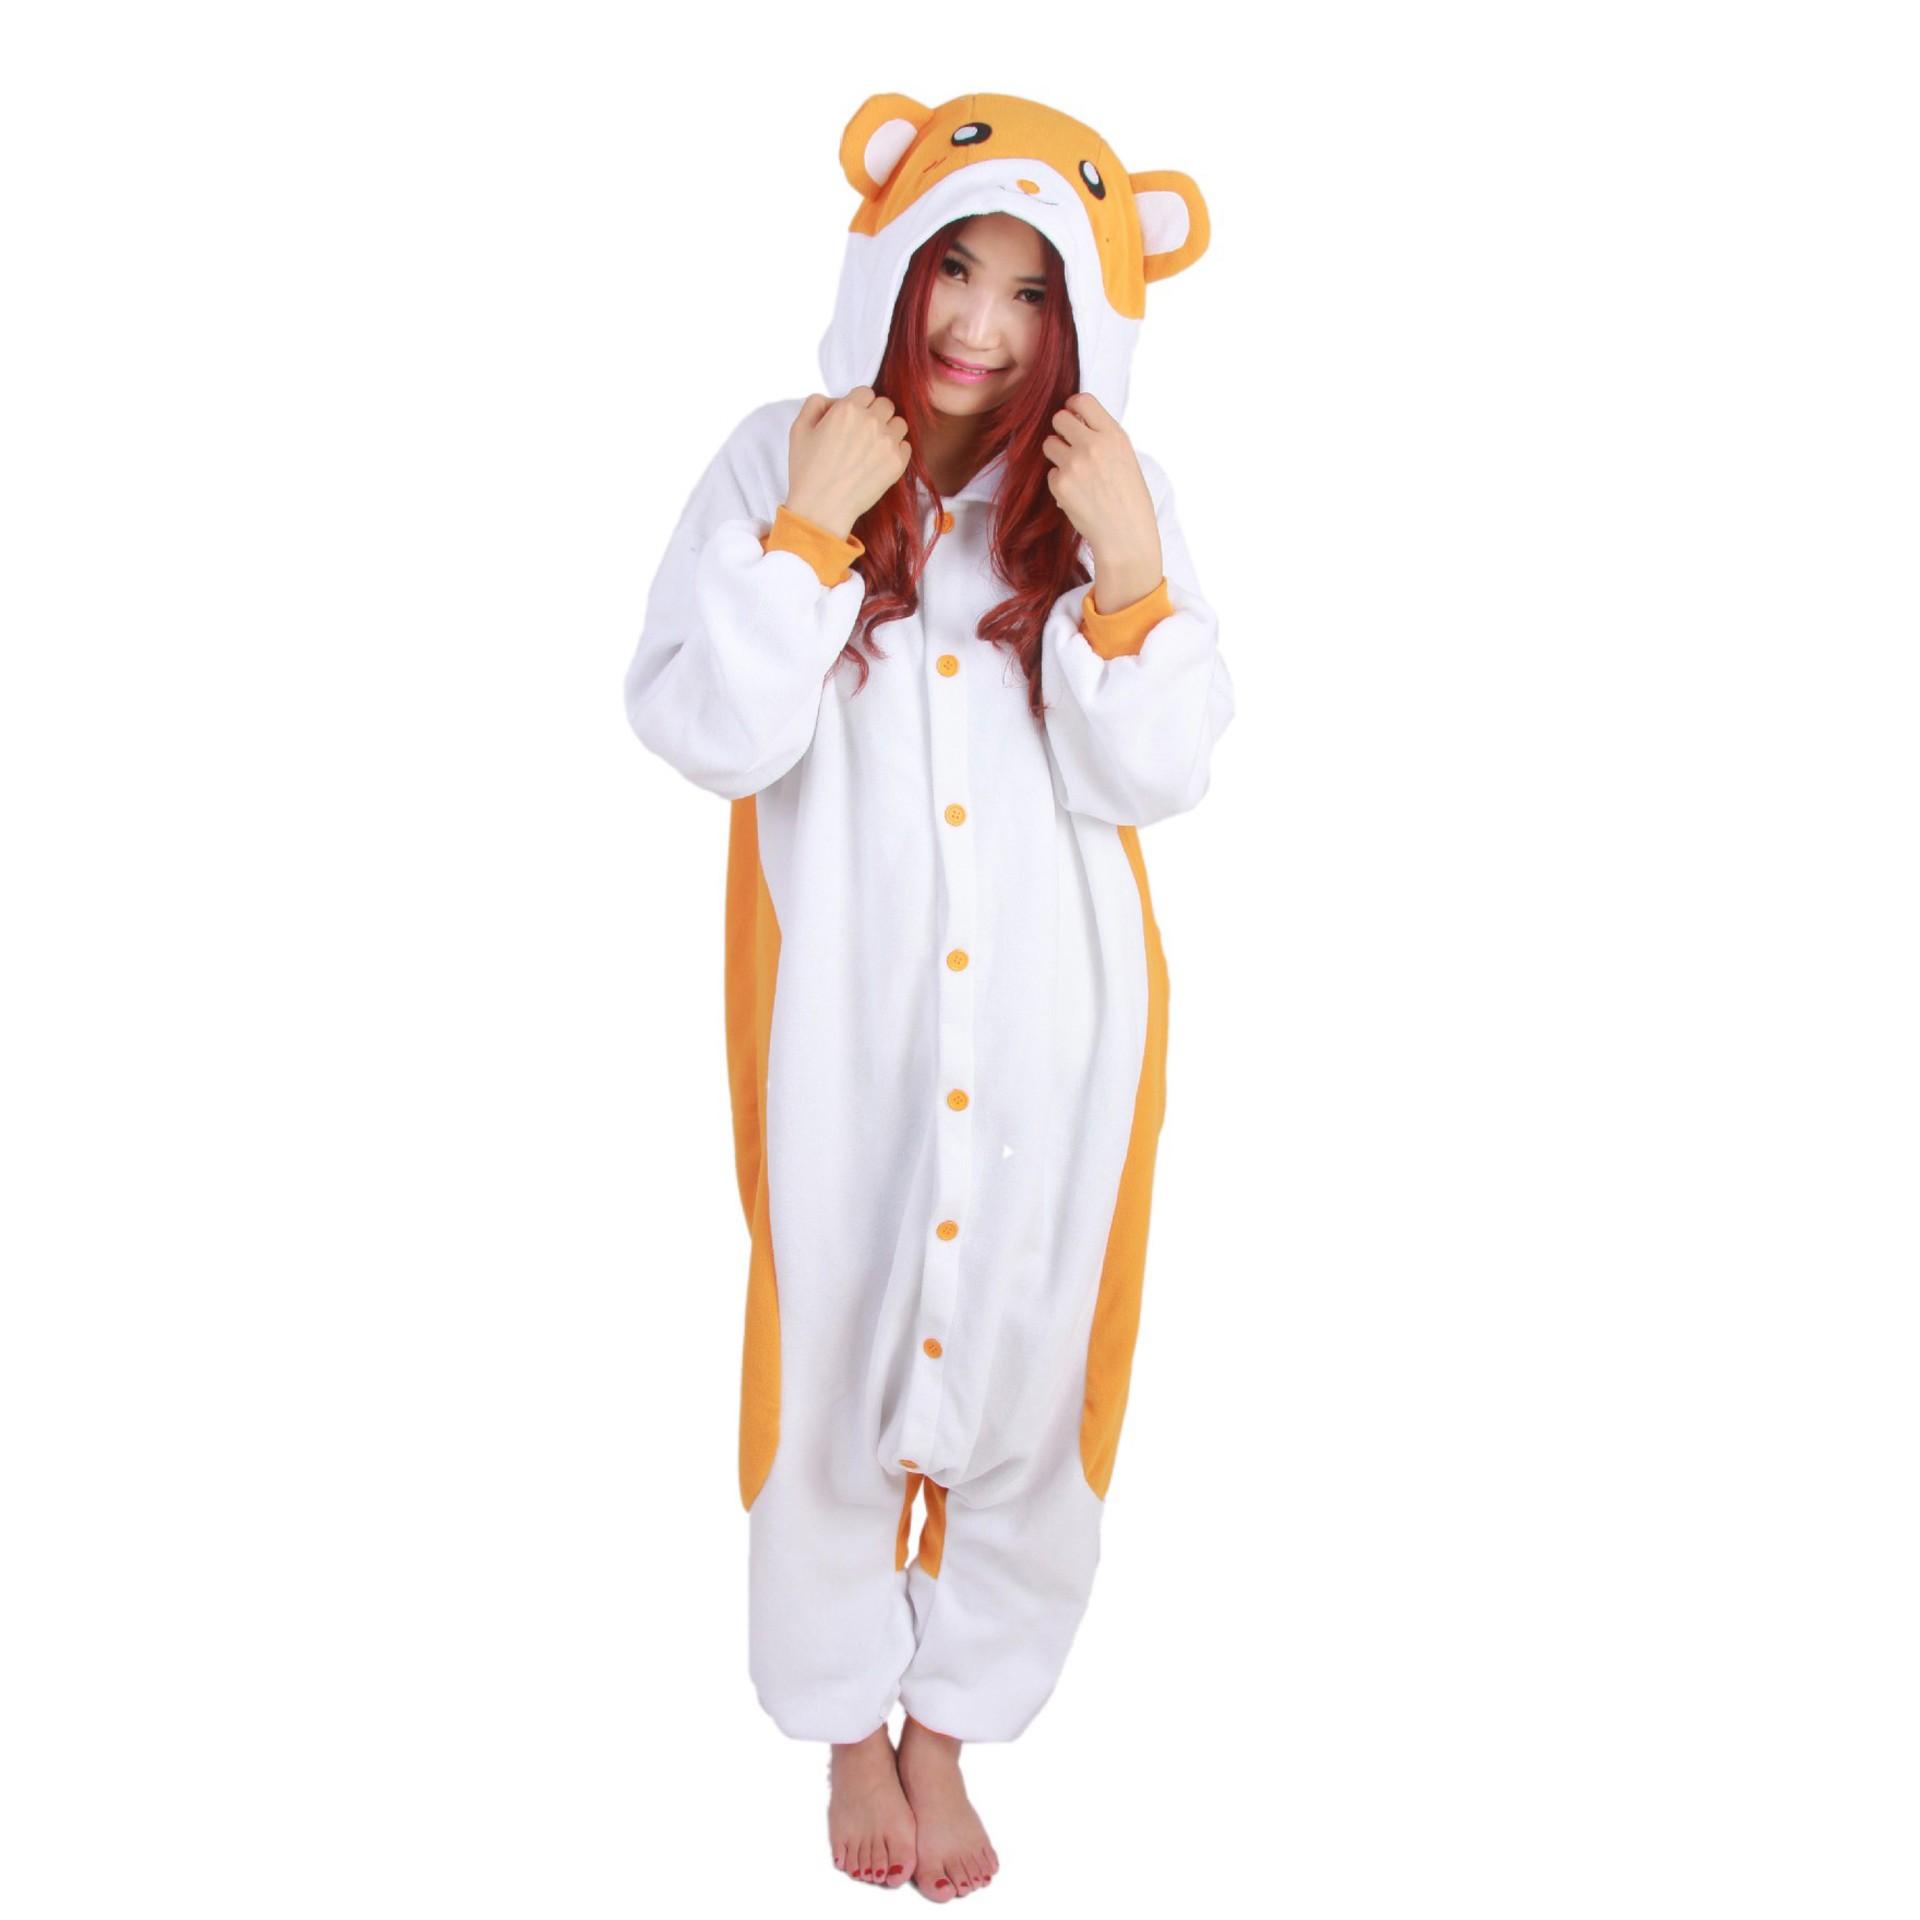 fef764376c10 Hamster Onesie Unisex Women   Men Animal Kigurumi Pajama Halloween Party  Costumes